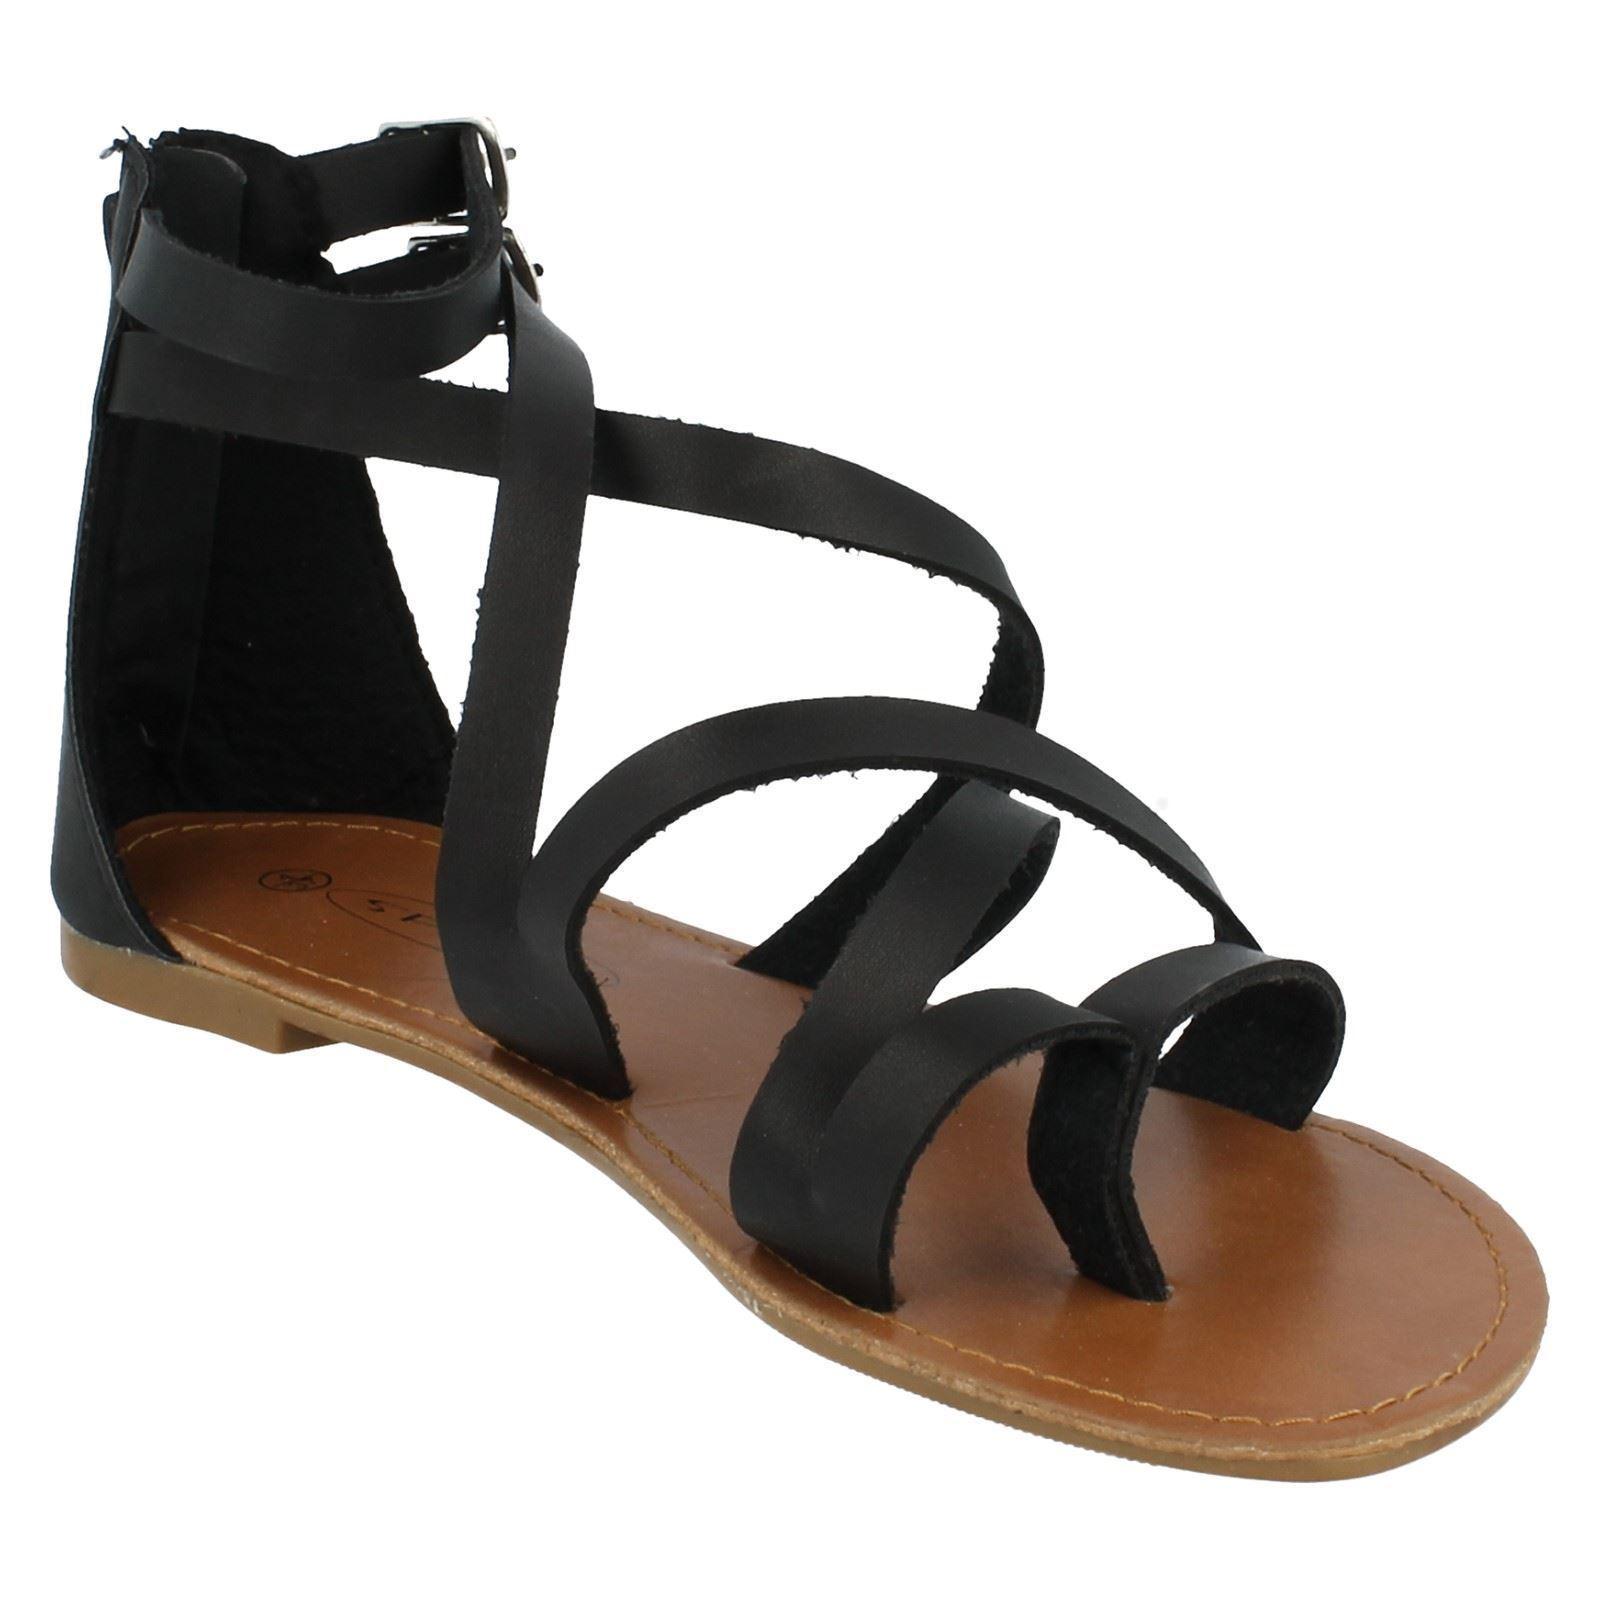 Spot On Ladies Ankle Strap Gladiator Sandals